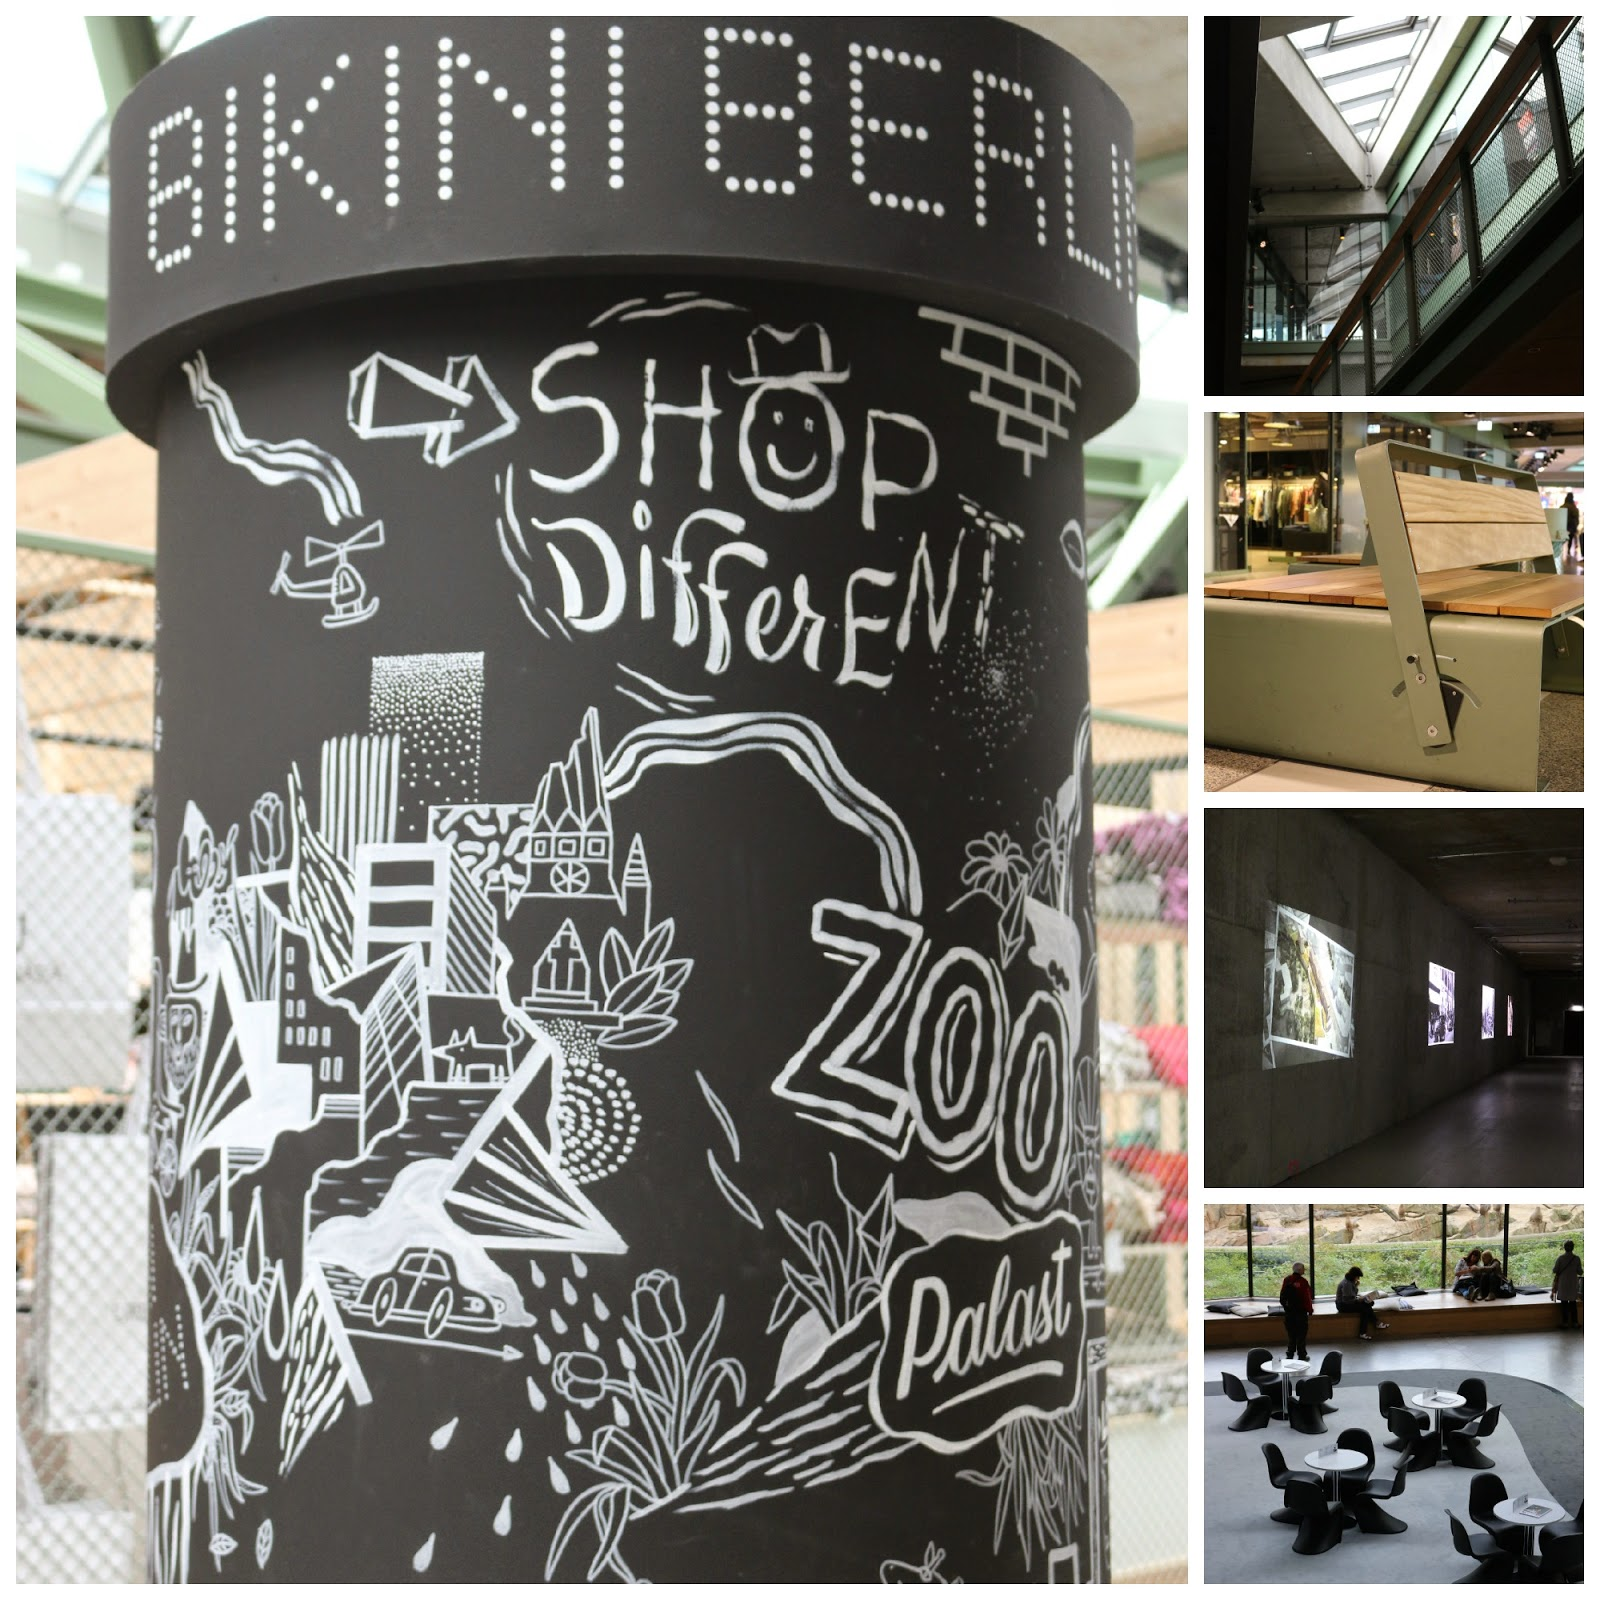 Berlin, Reisetipps, Städtereise, Tipps, Restaurants, Cafés, Shopping, Shops, Tourismus, Potsdam, Bikini